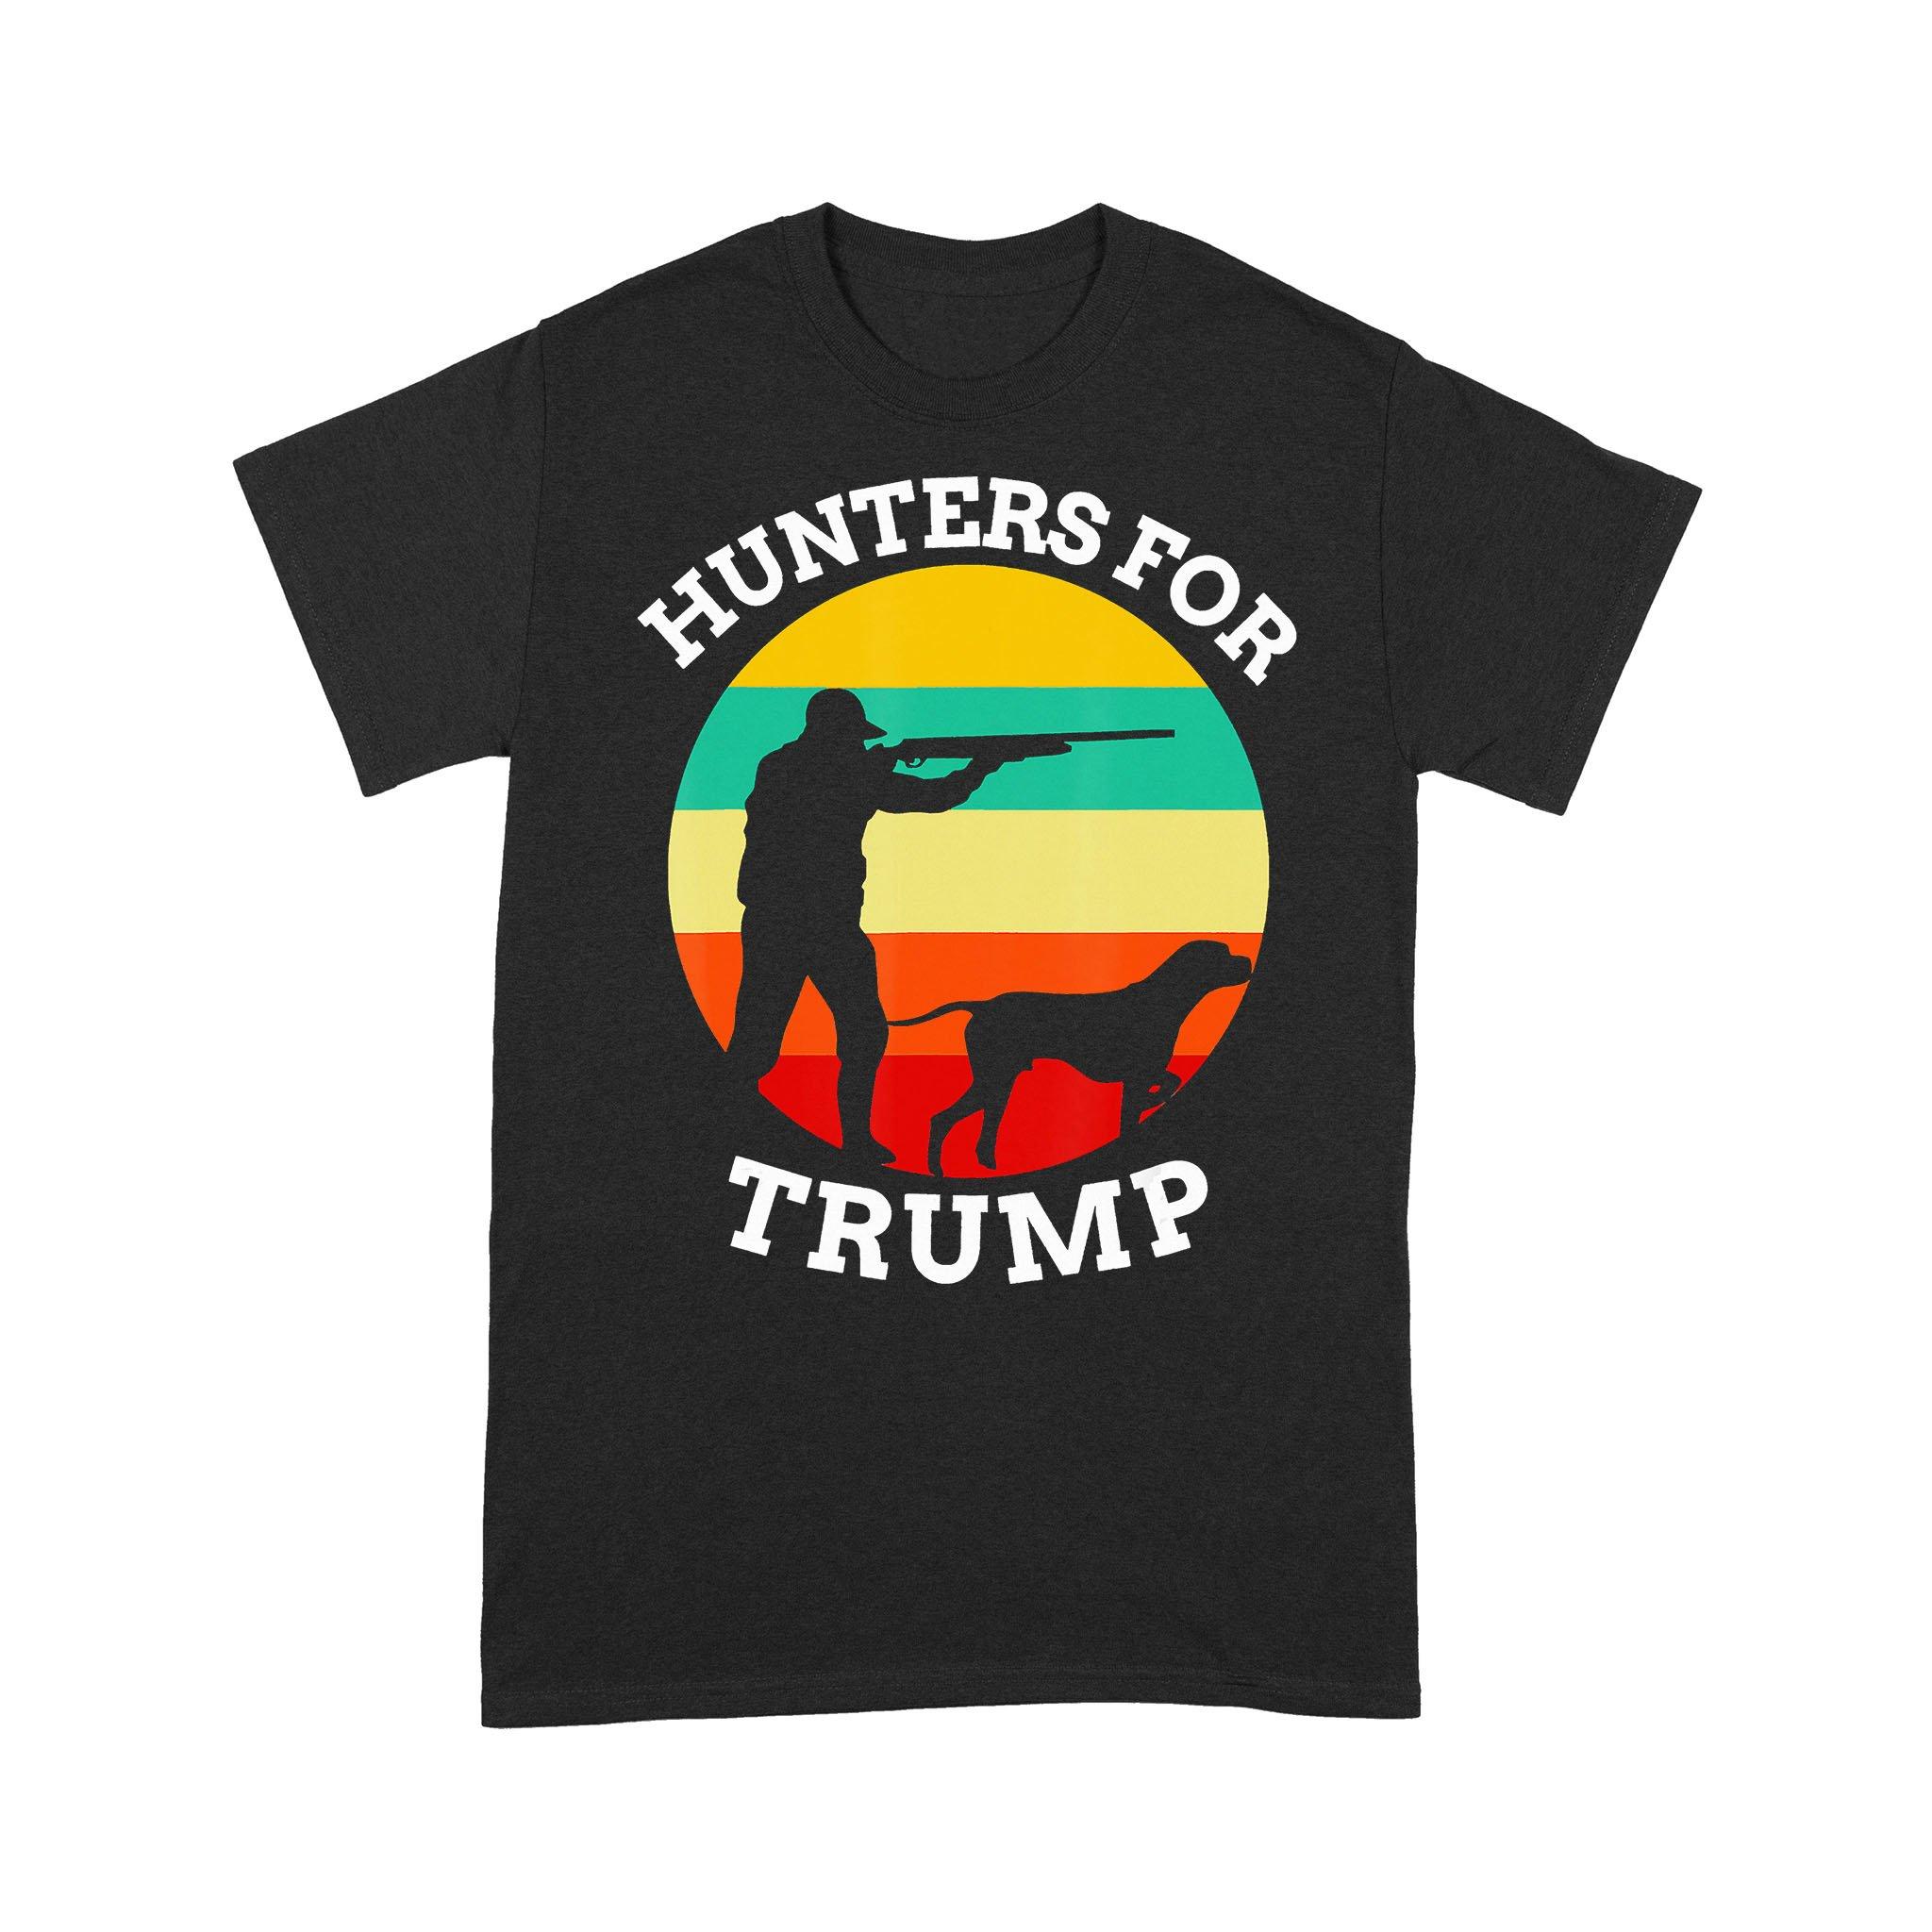 Hunters Protrump Pence Election 2020 T-shirt